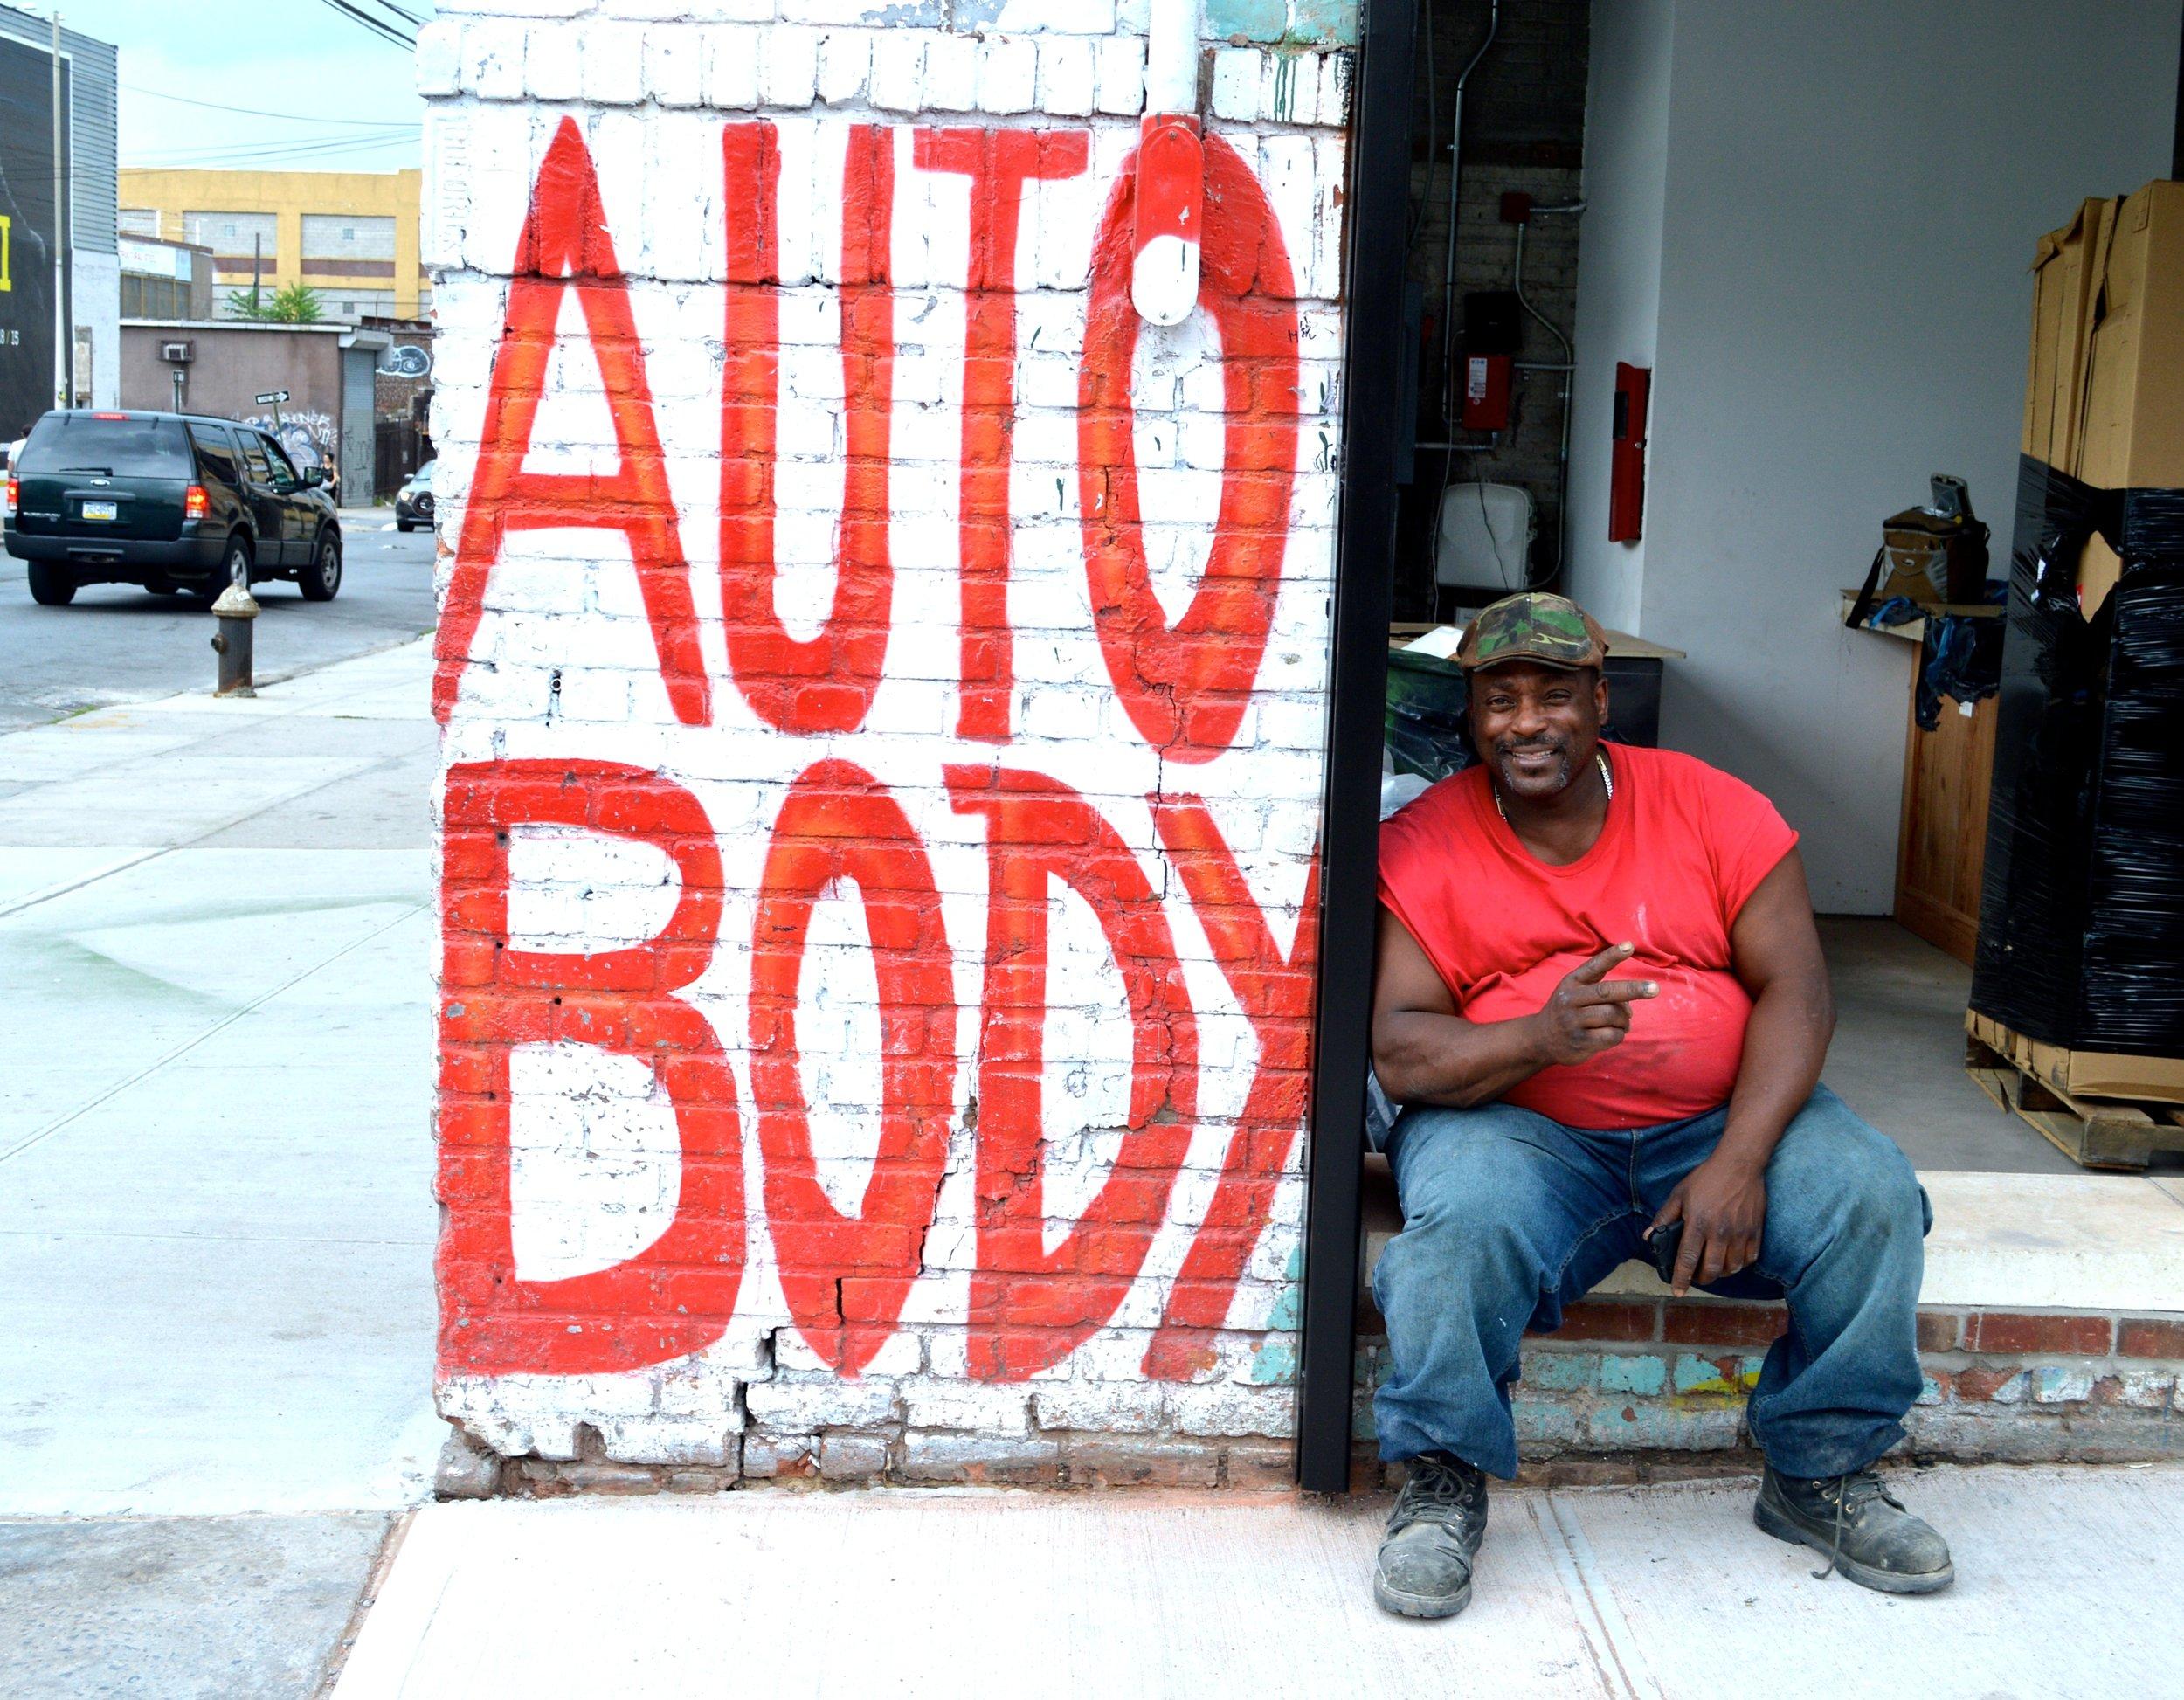 autobody.JPG